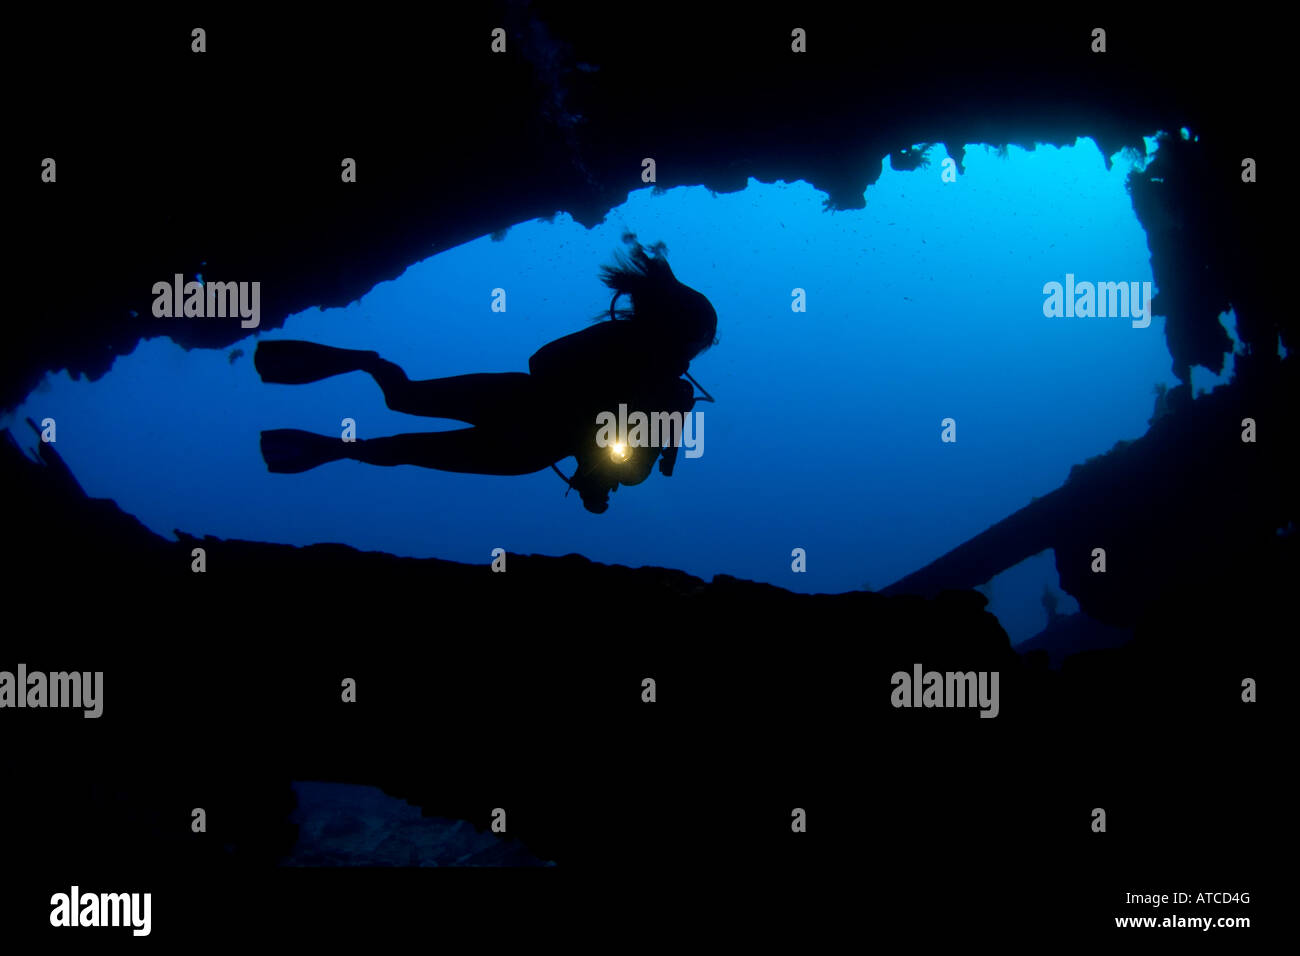 Diver y naufragio, Mar Rojo, Egipto, submarino, buceo, submarinismo, océano, mar, buceador, silueta femenina, Imagen De Stock